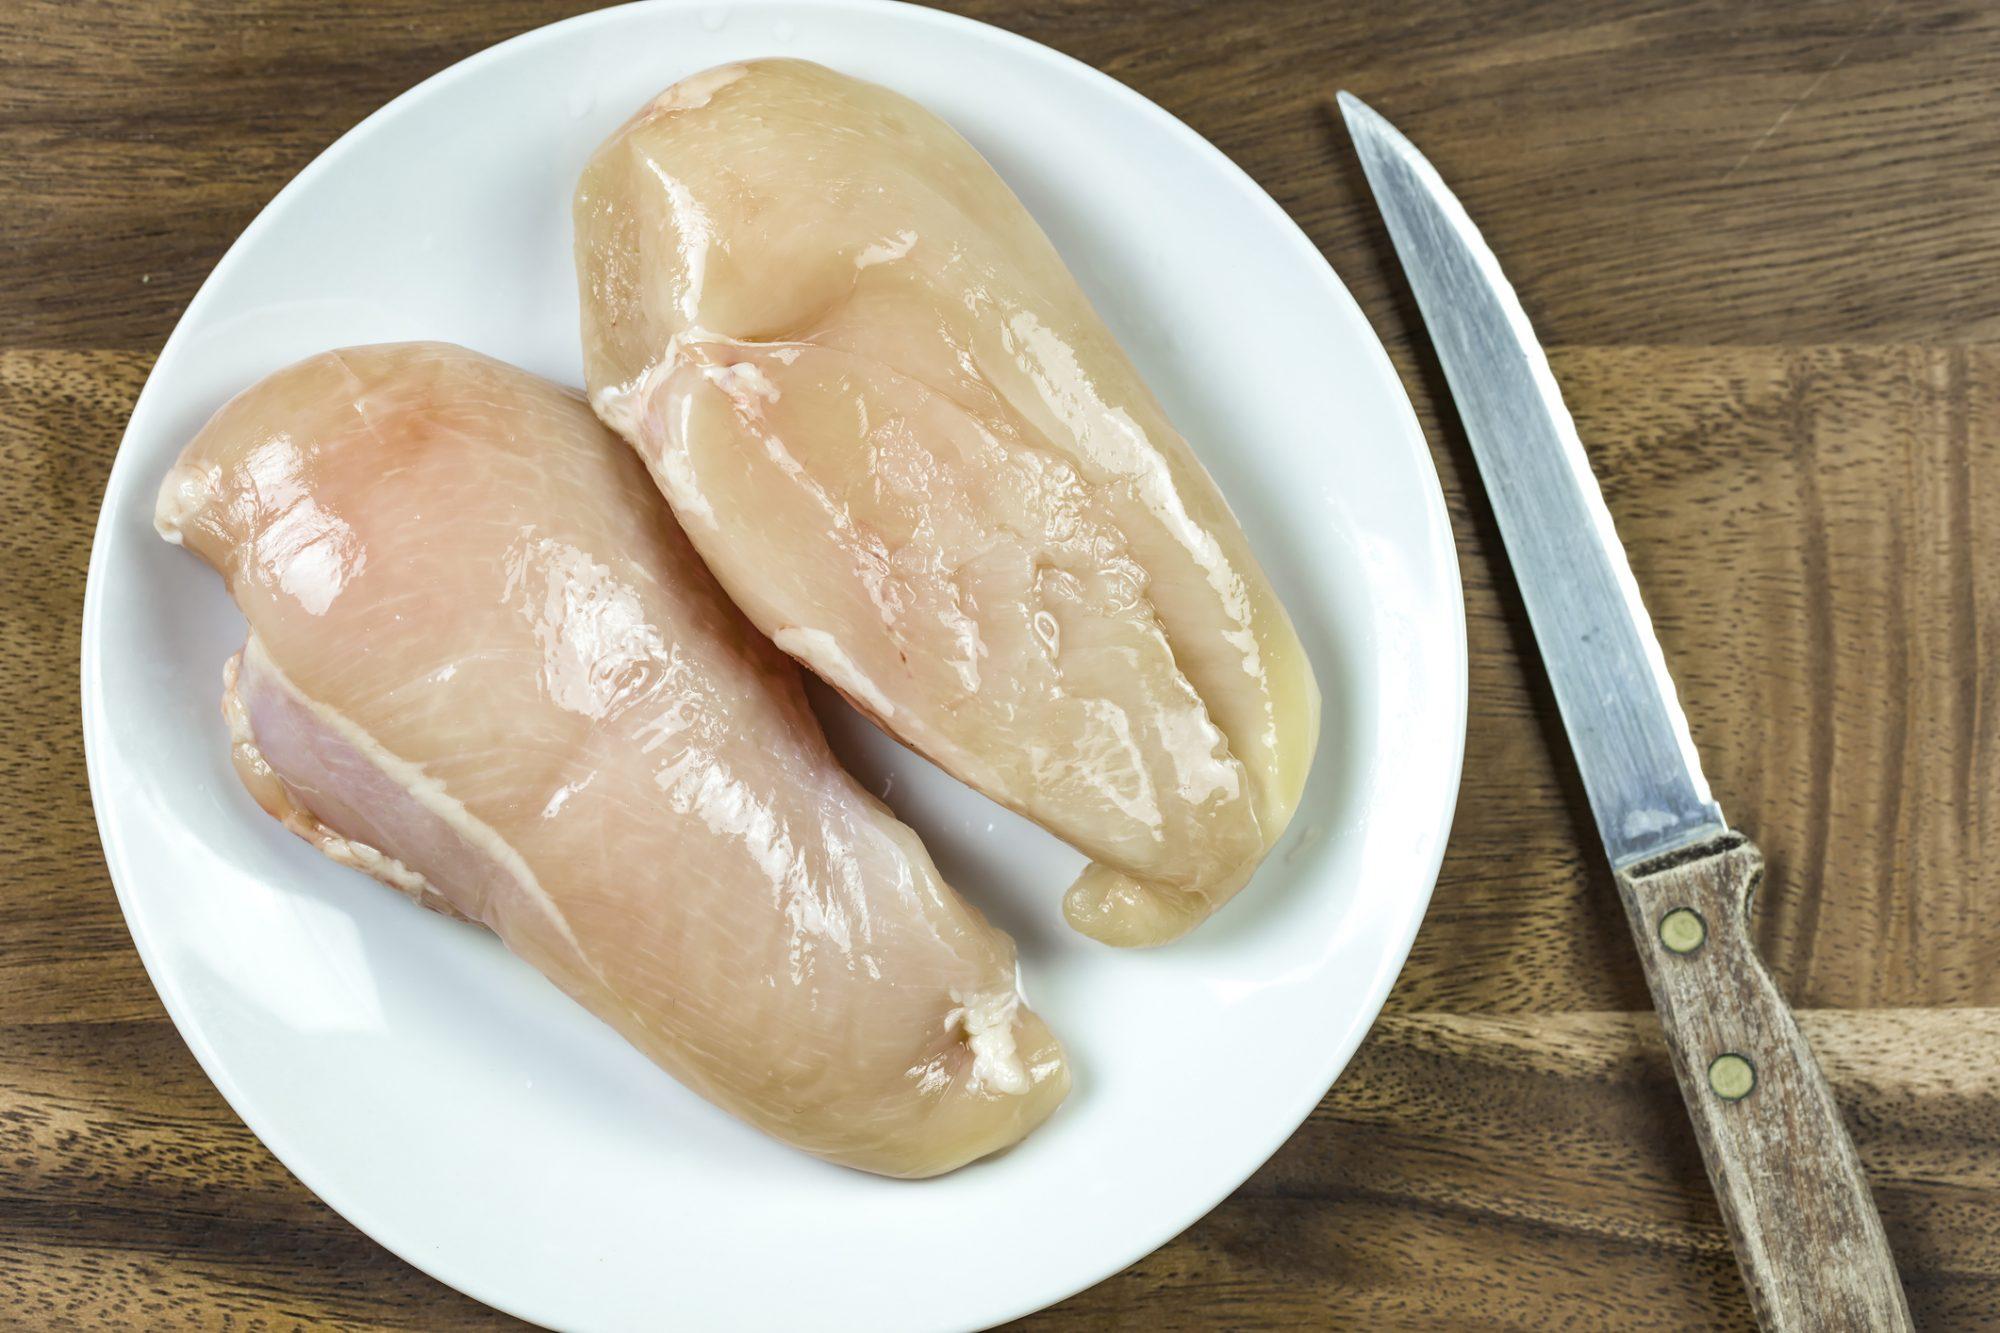 Raw chicken breast on white plate